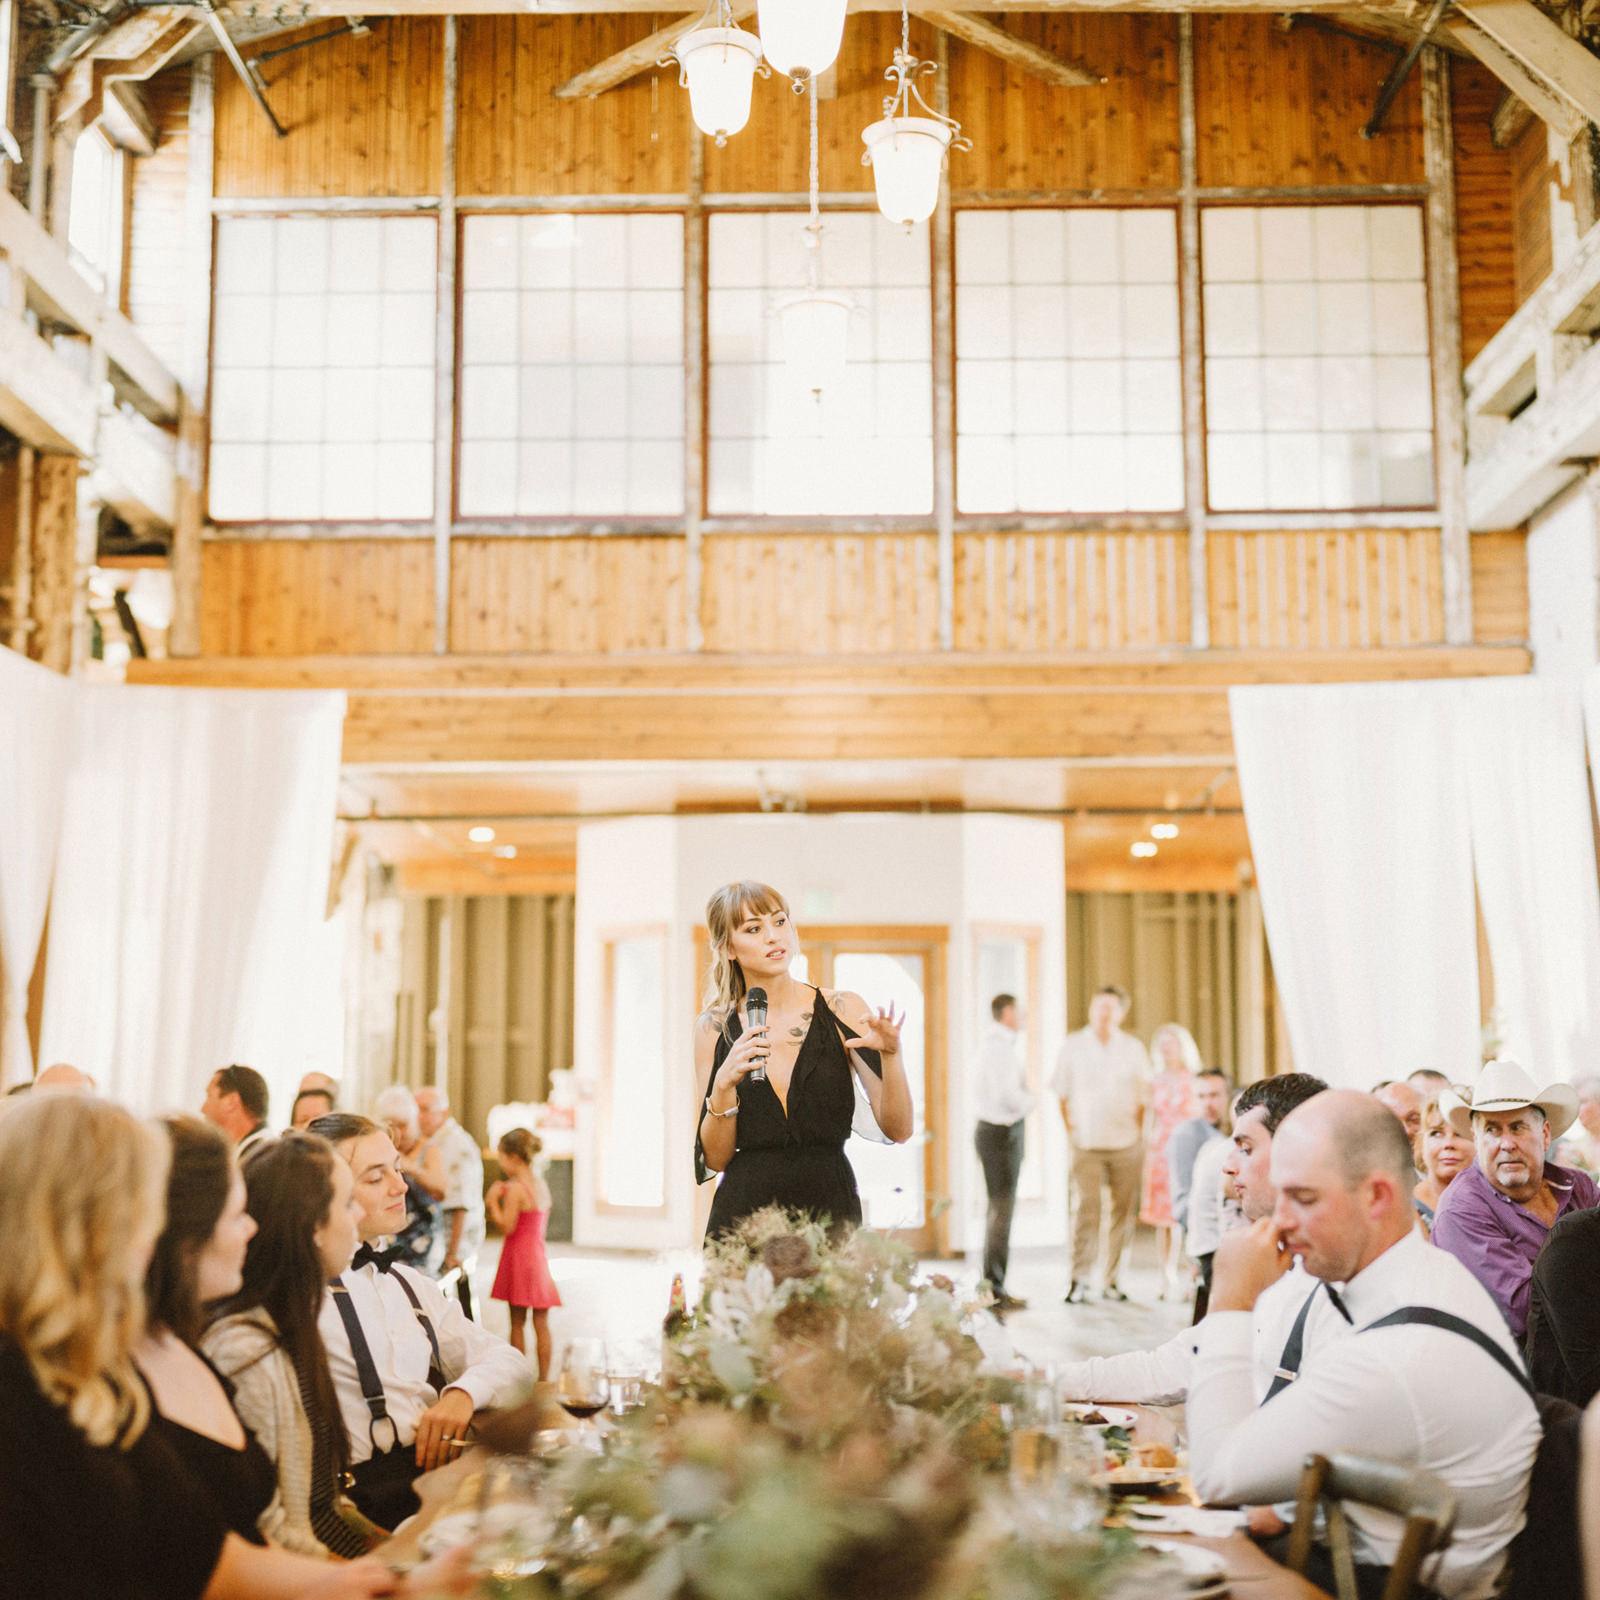 sodo-park-wedding-067 SODO PARK WEDDING